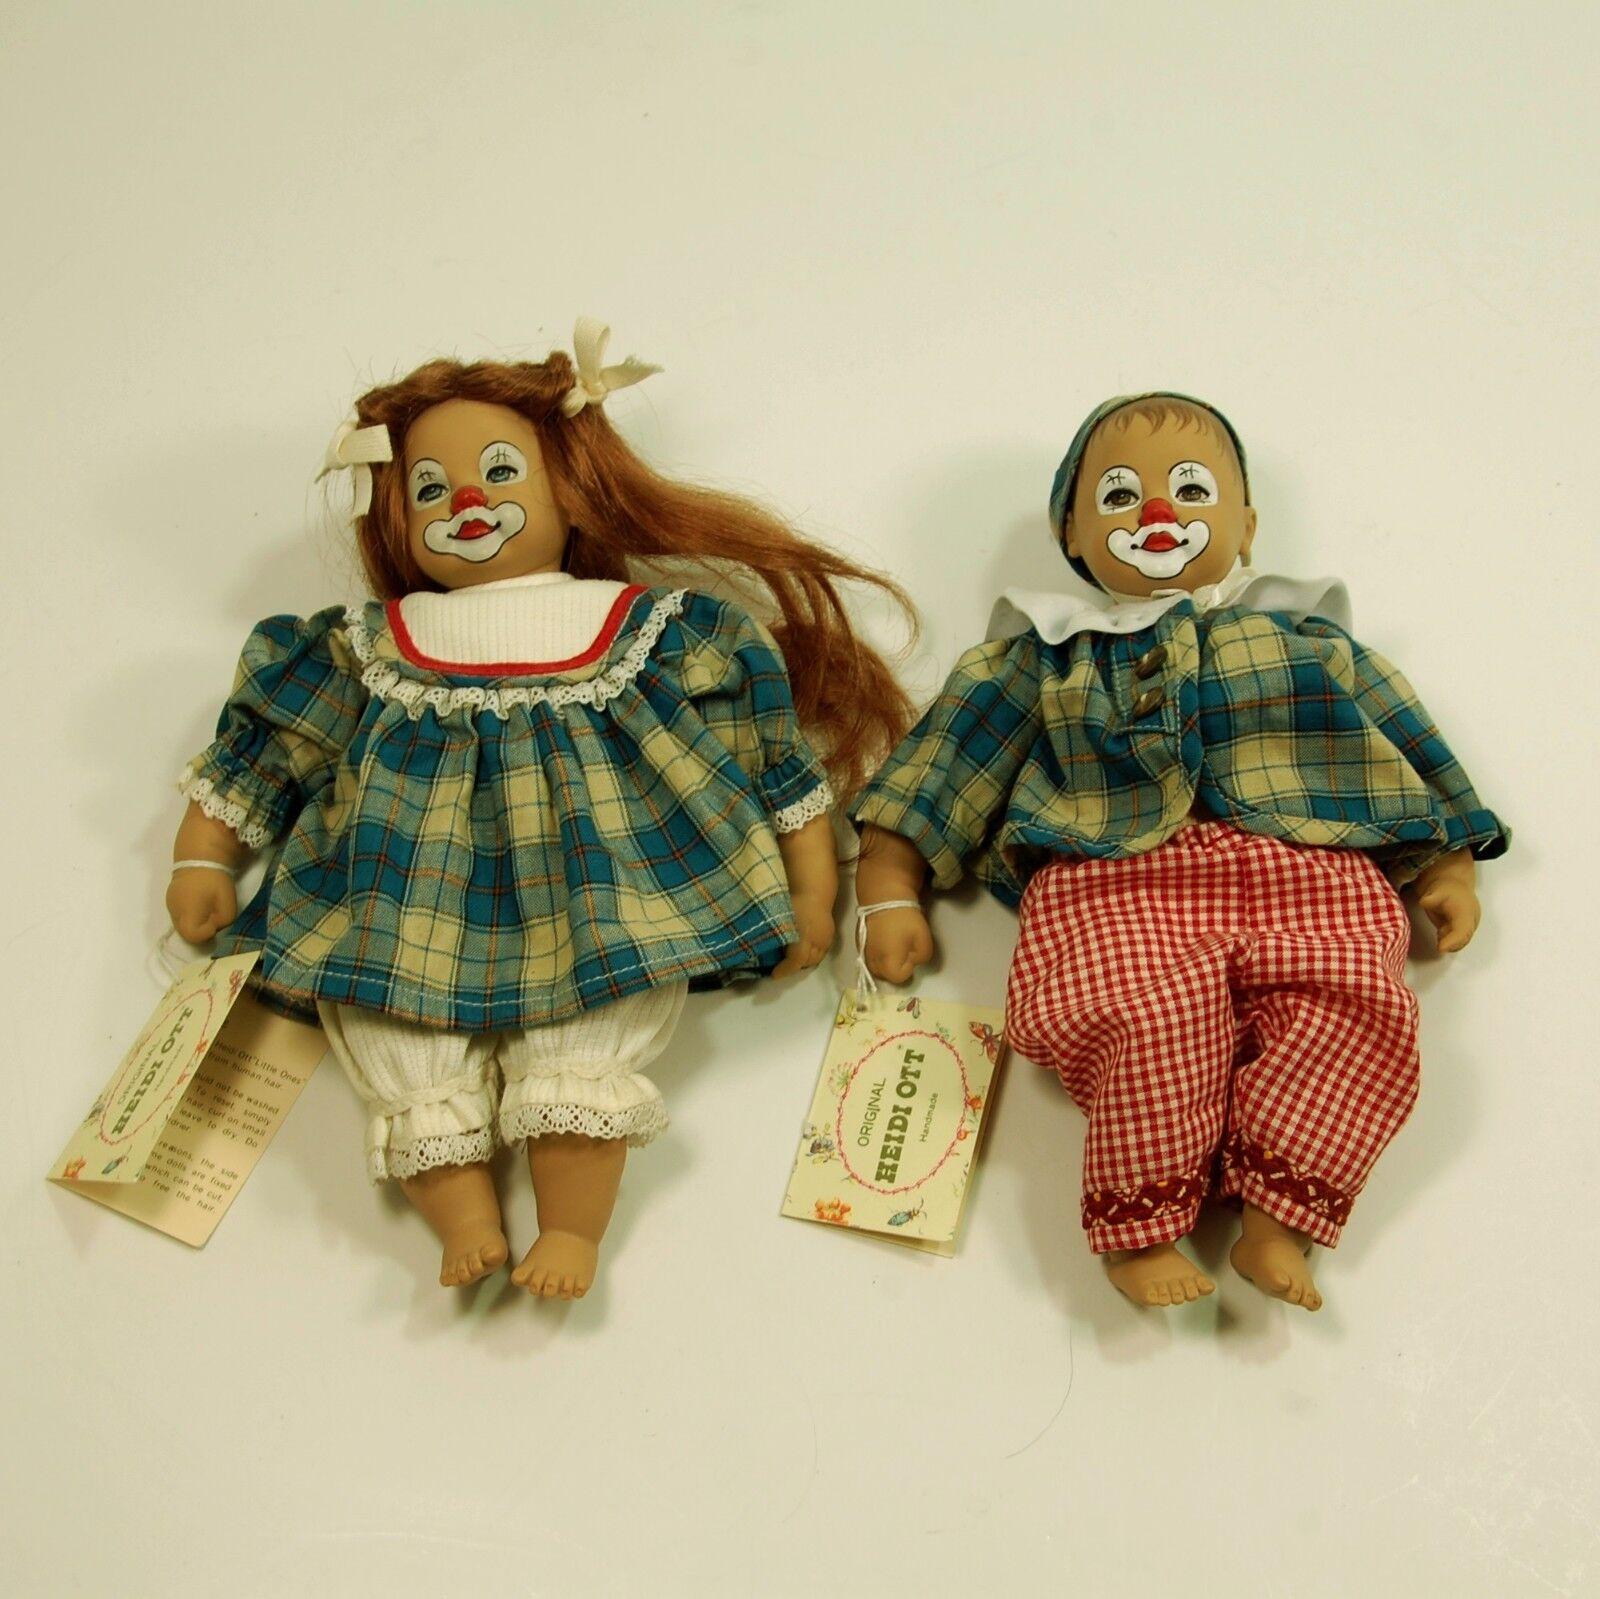 RARE Heidi Ott clown - handpainted set - boy &gGirl dolls - 8 1 2  tall